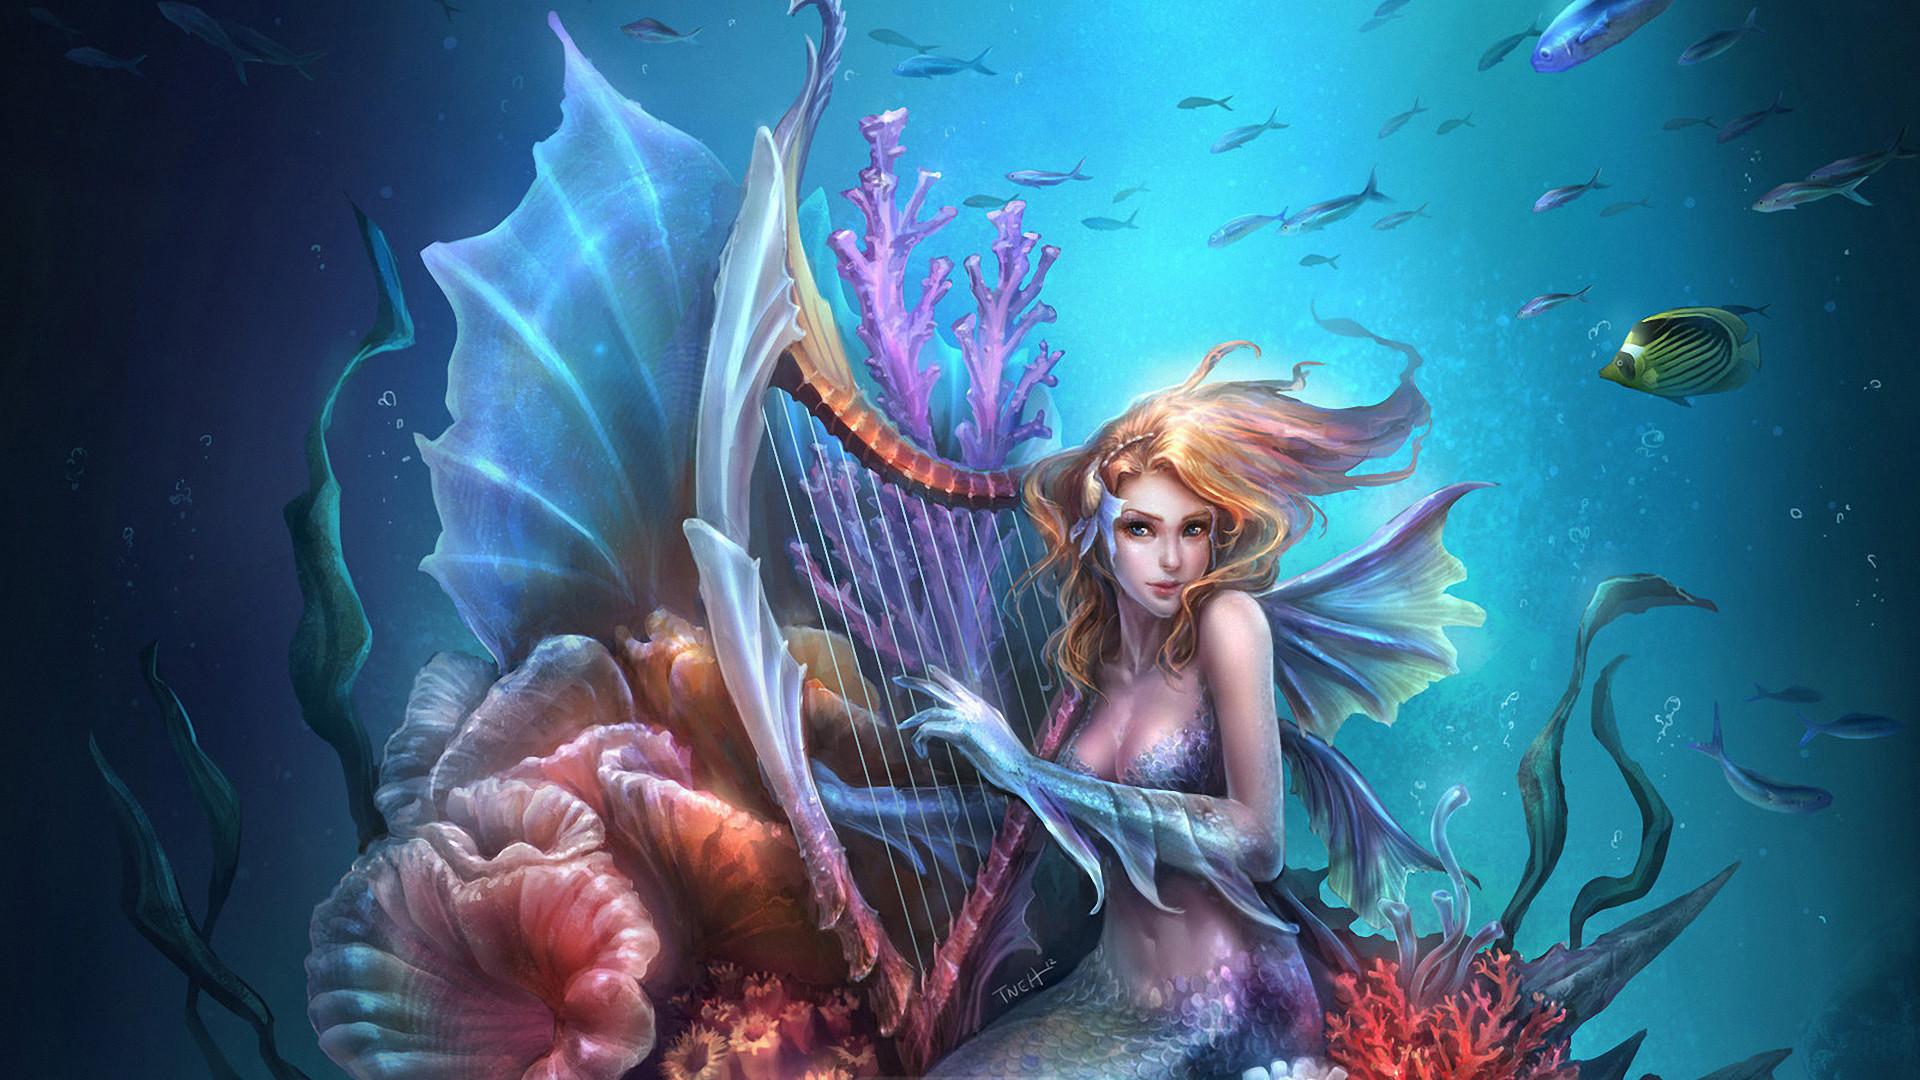 Fantasy mermaid art wallpaper     29103   WallpaperUP